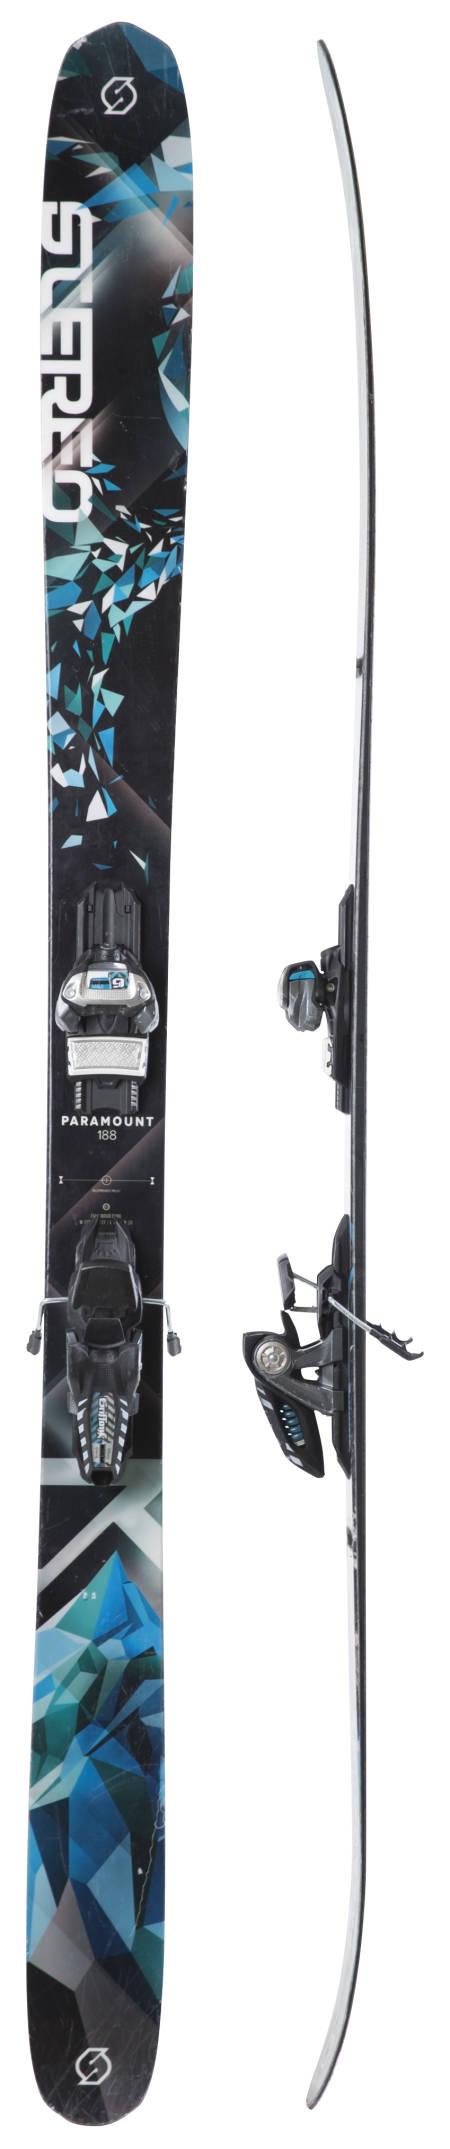 Stereo Paramount